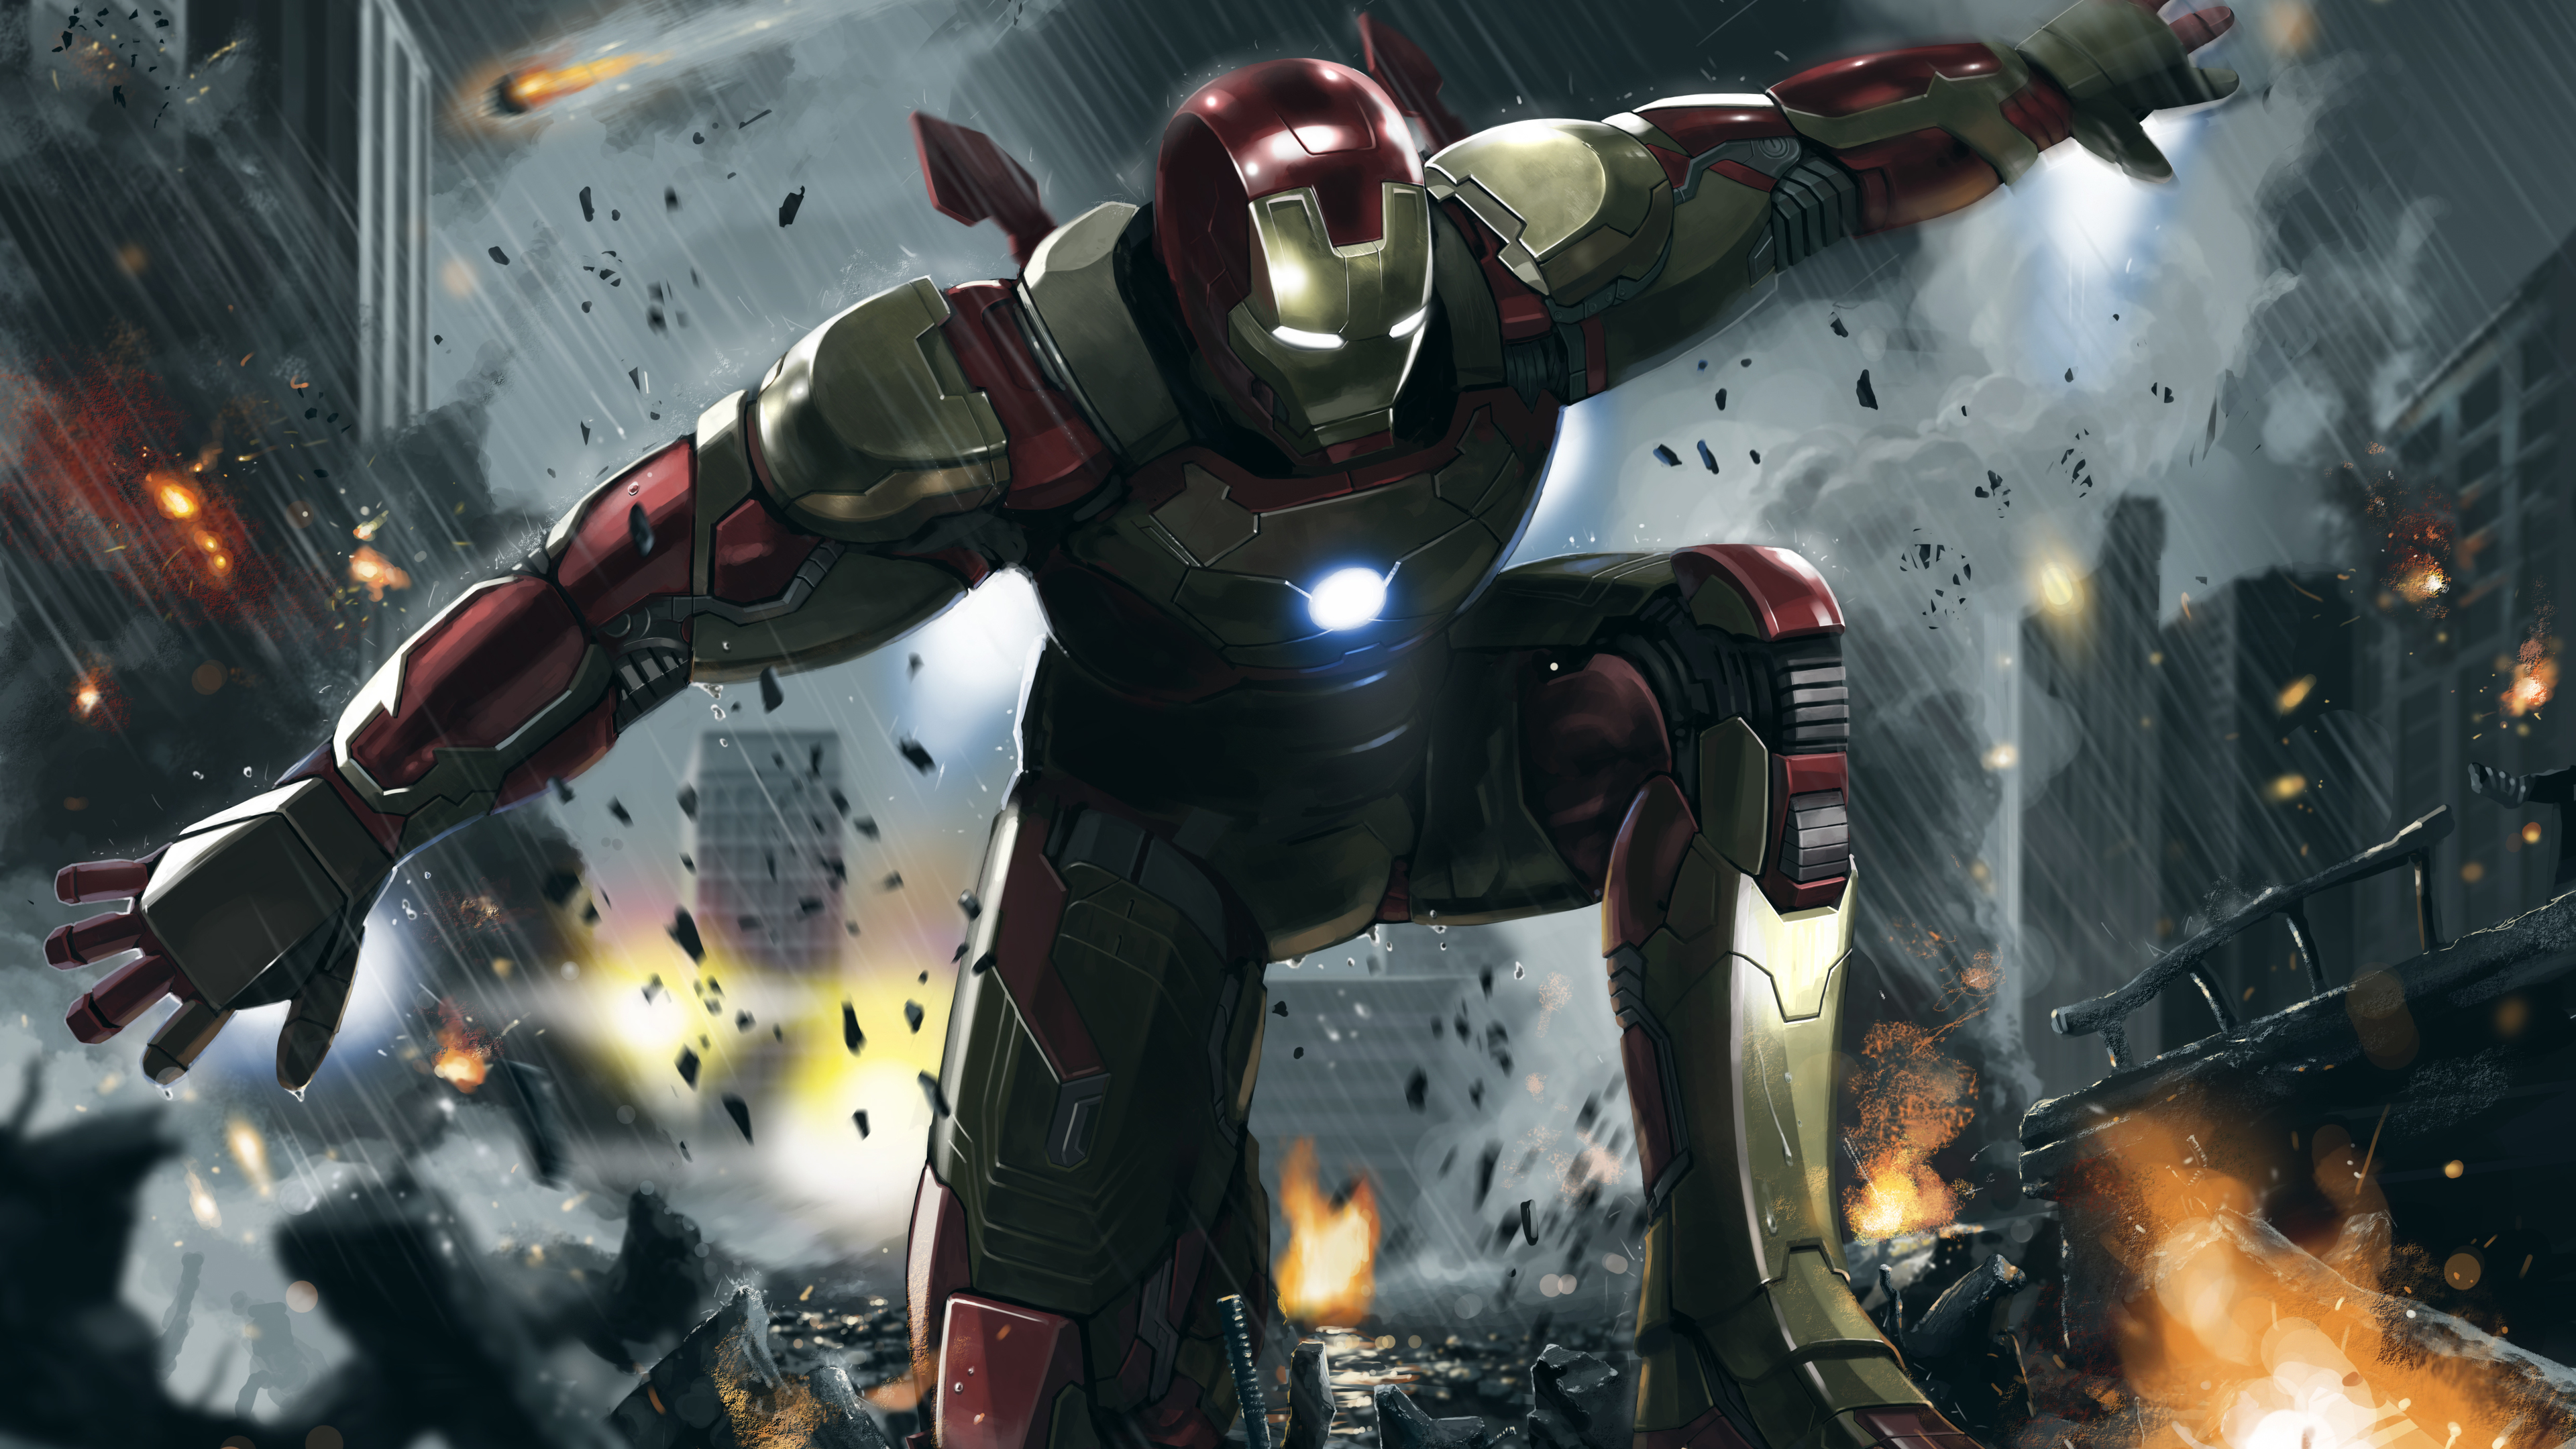 Wallpaper 4k Iron Man 3 Art 4k 4k Wallpapers Artwork Wallpapers